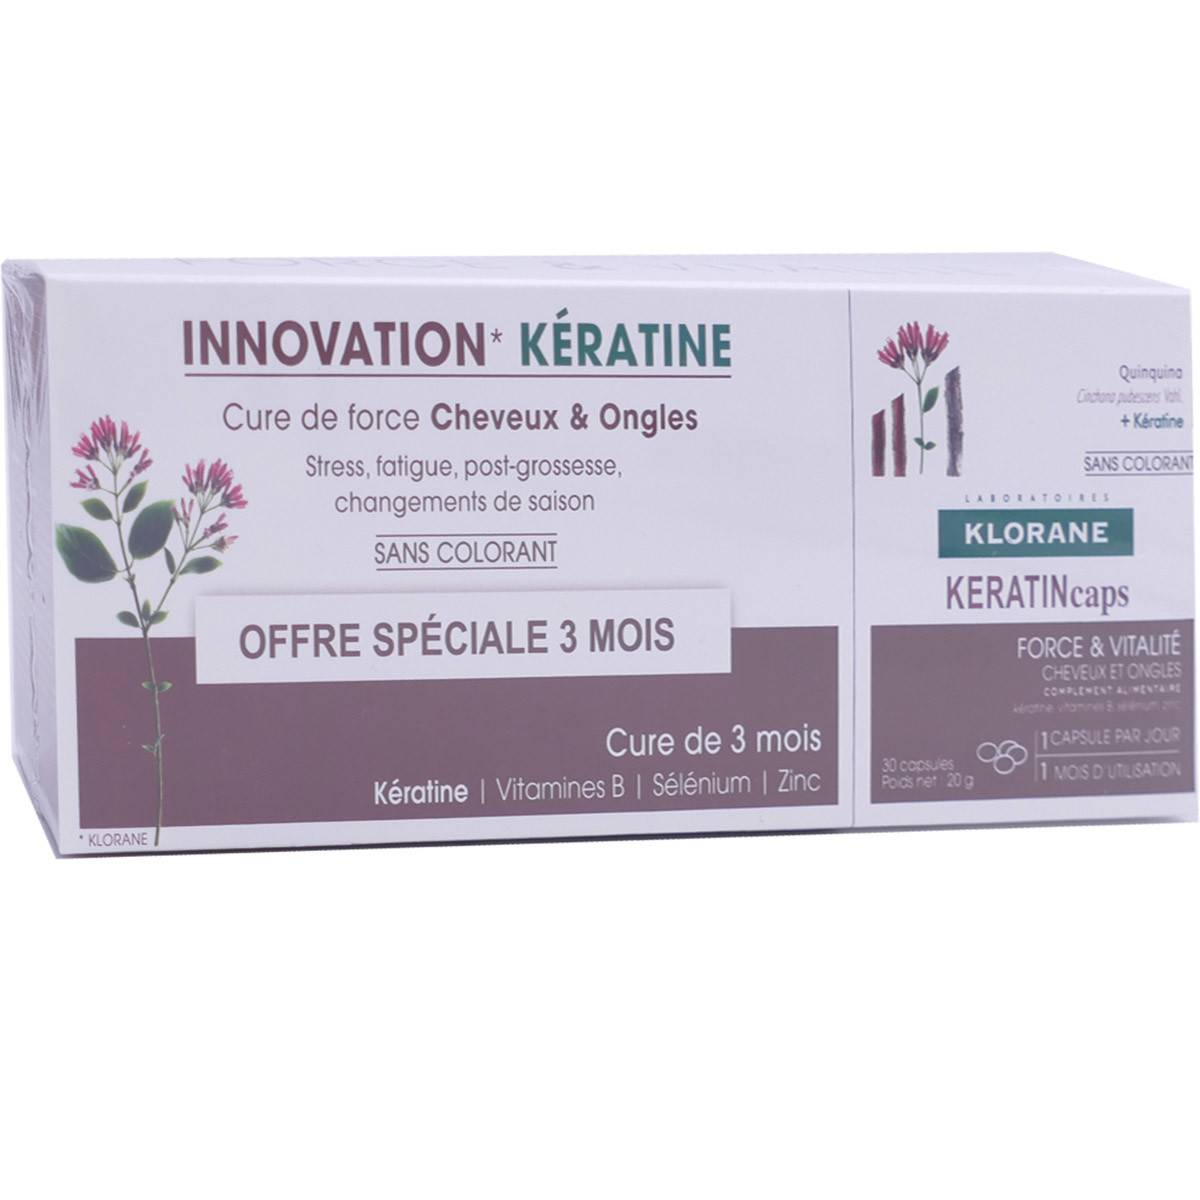 Klorane innovation keratine 3x30 capsules